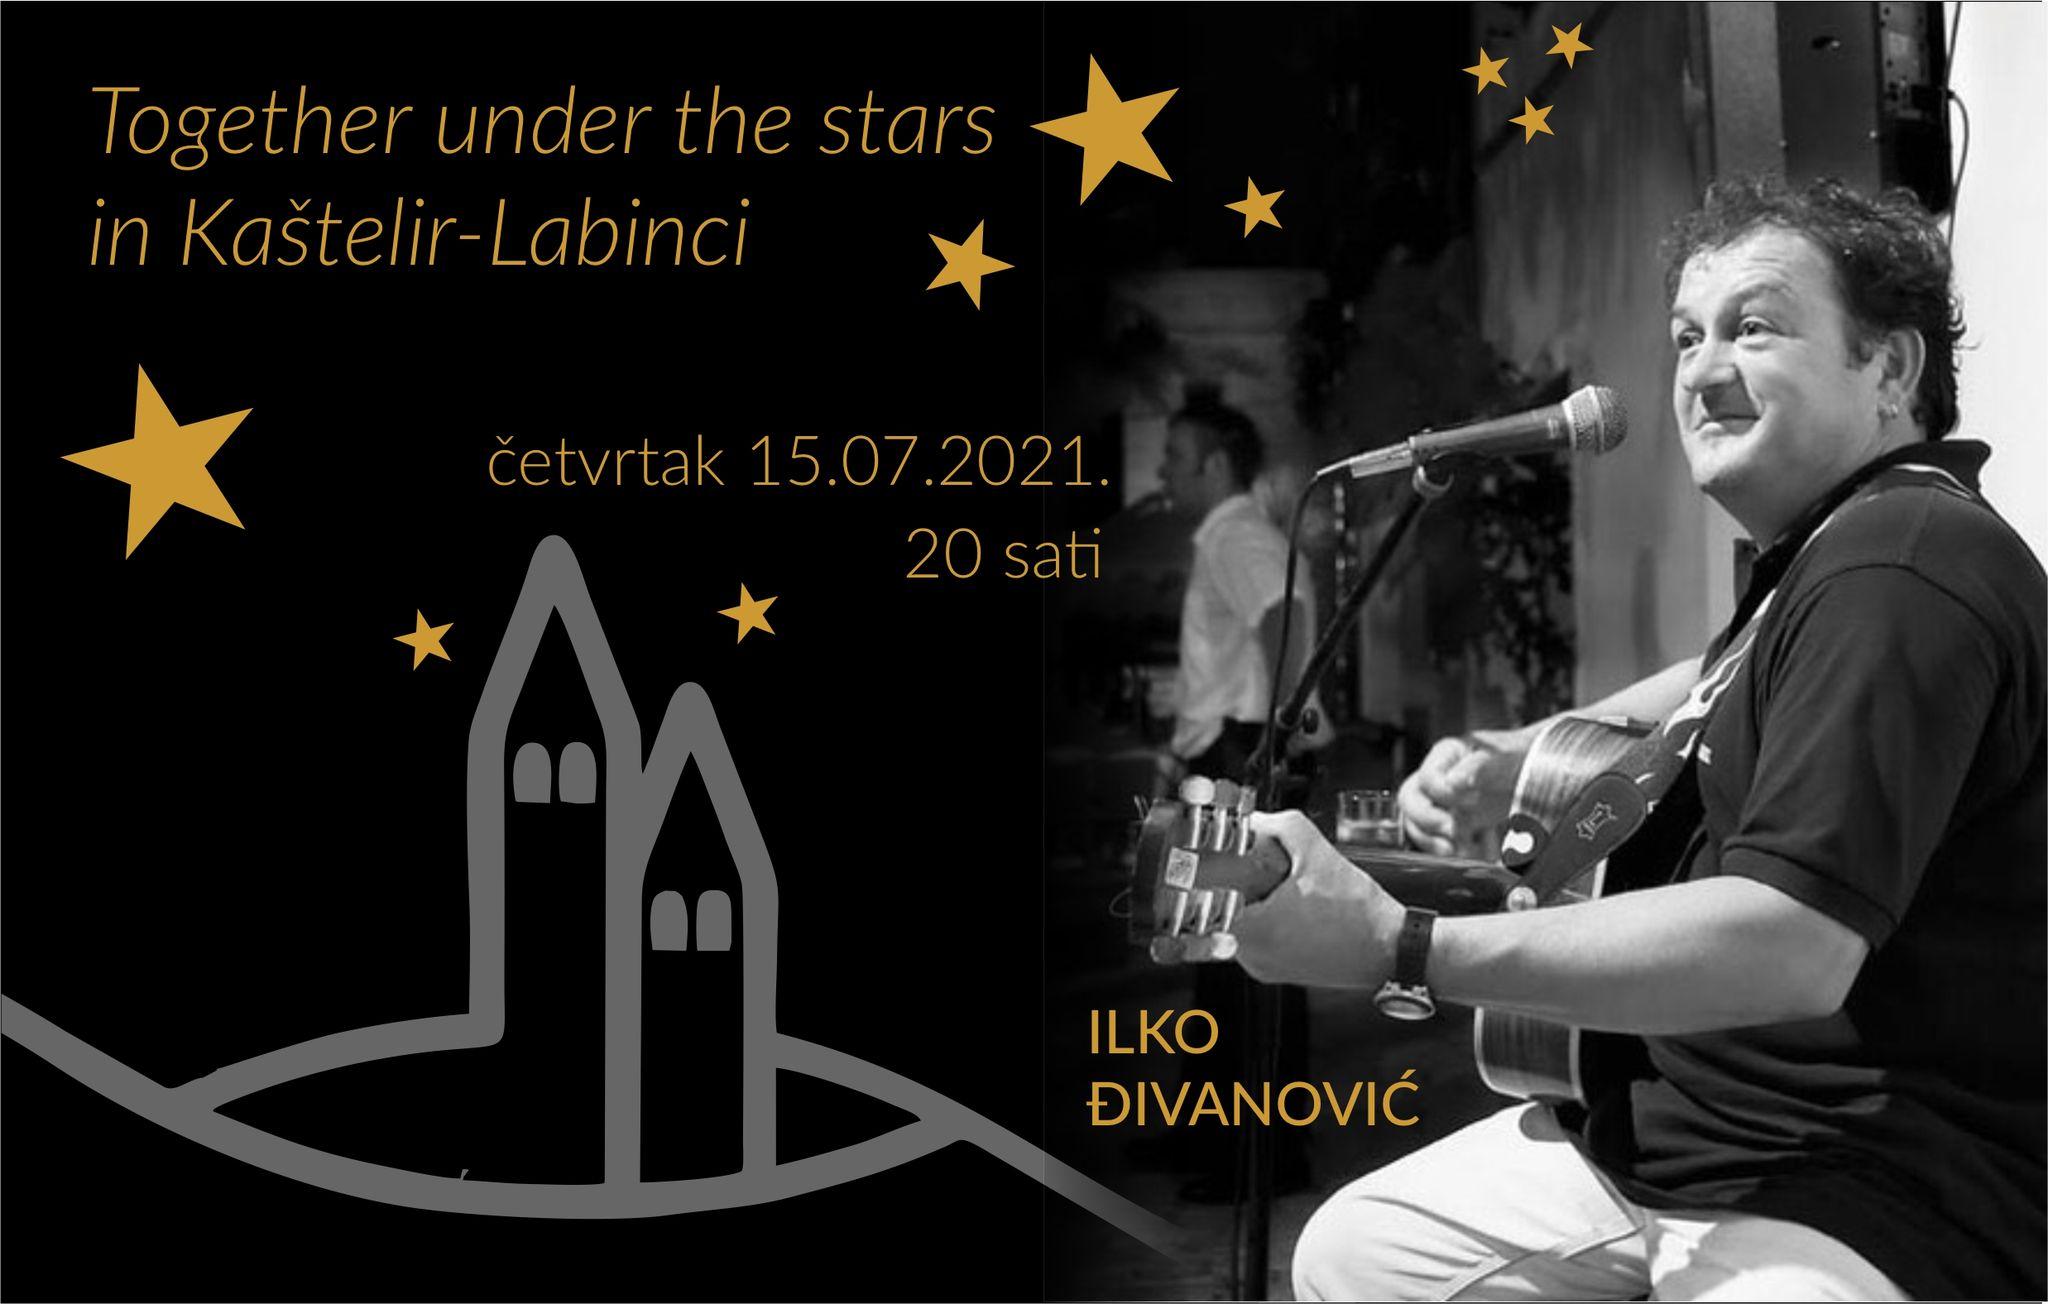 Together under the stars in Kaštelir-Labinci